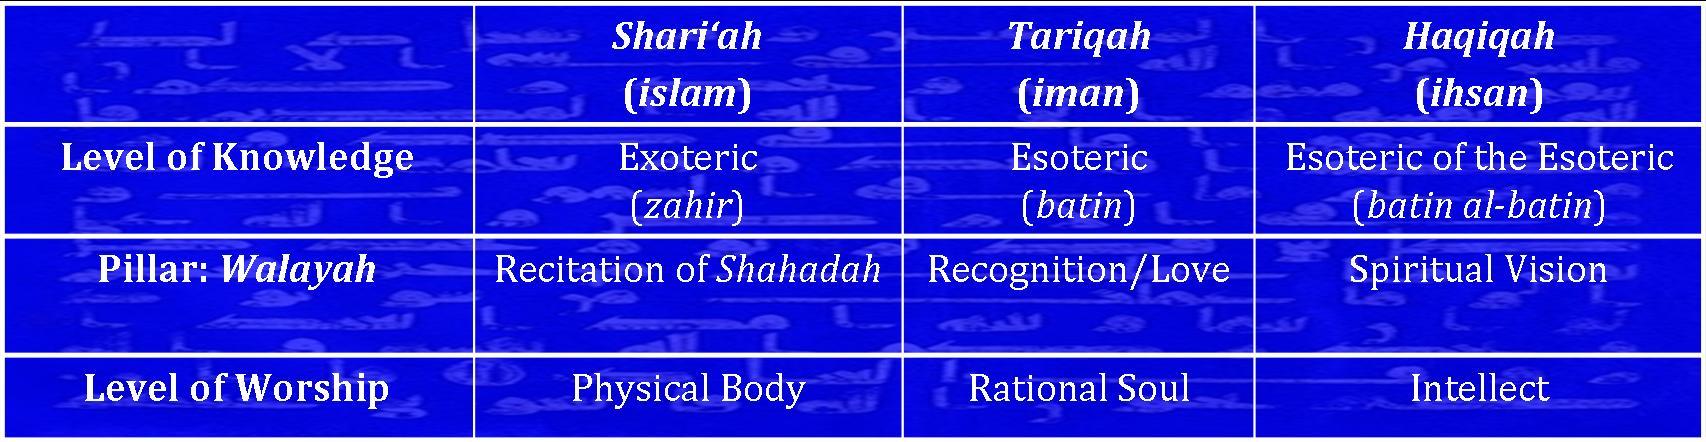 the seven pillars of islam the esoterics of walāyah ismaili gnosis